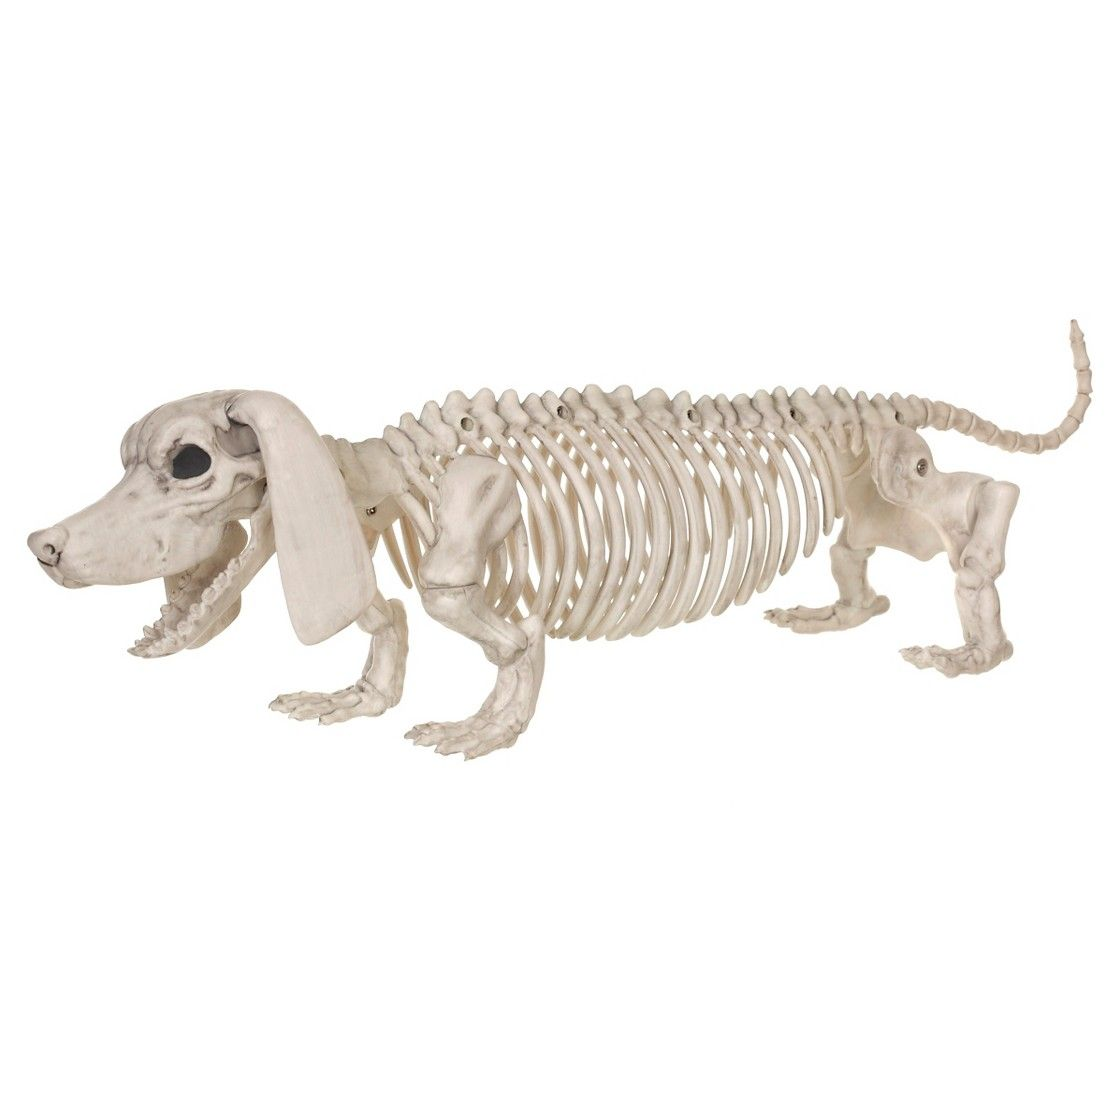 Dachshund Halloween Decorations.Halloween Dachshund Dog Skeleton Dog Skeleton Halloween Skeletons Target Halloween